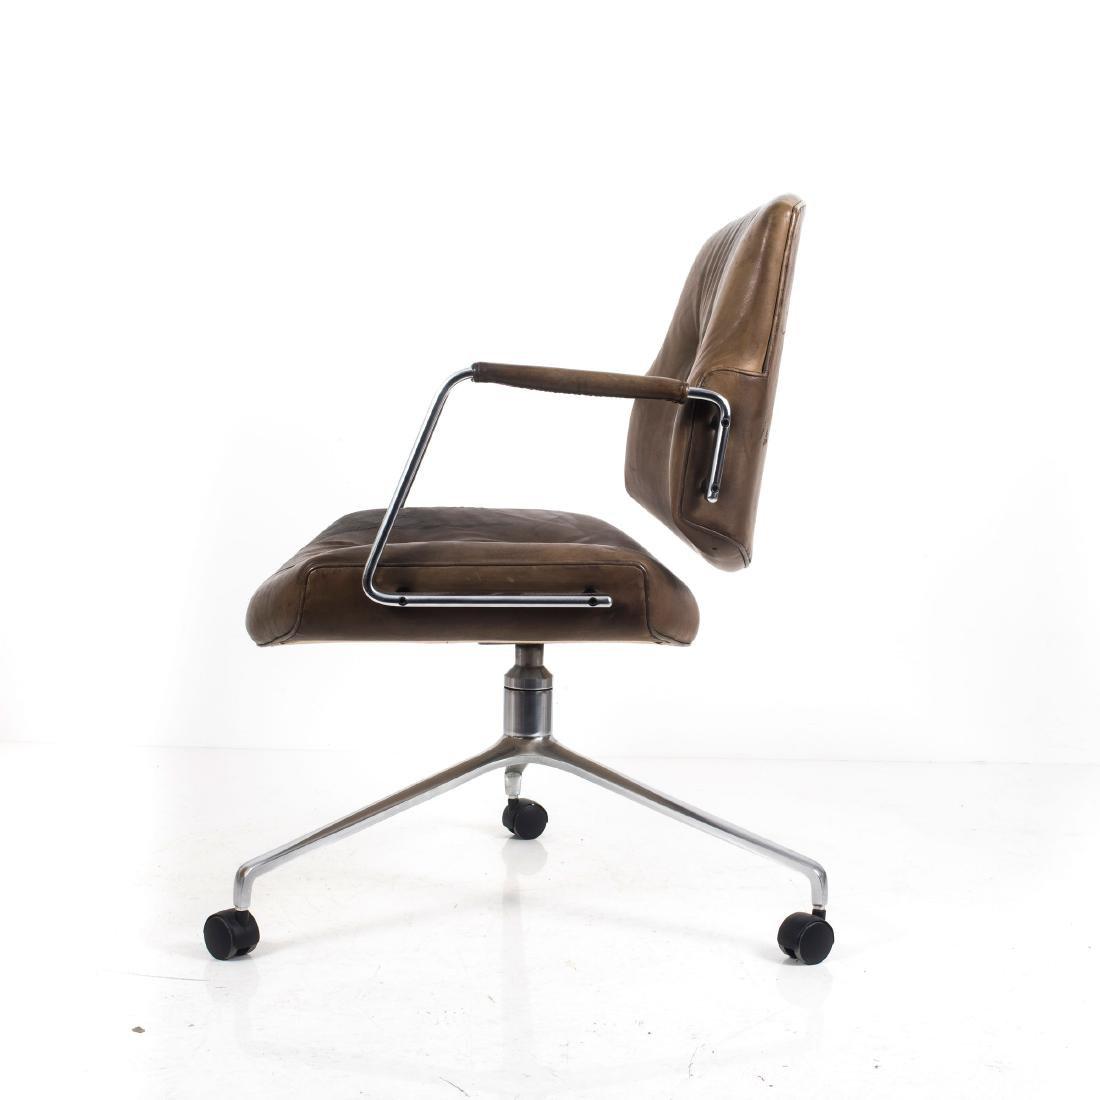 'DK-2' armchair, c. 1965 - 3